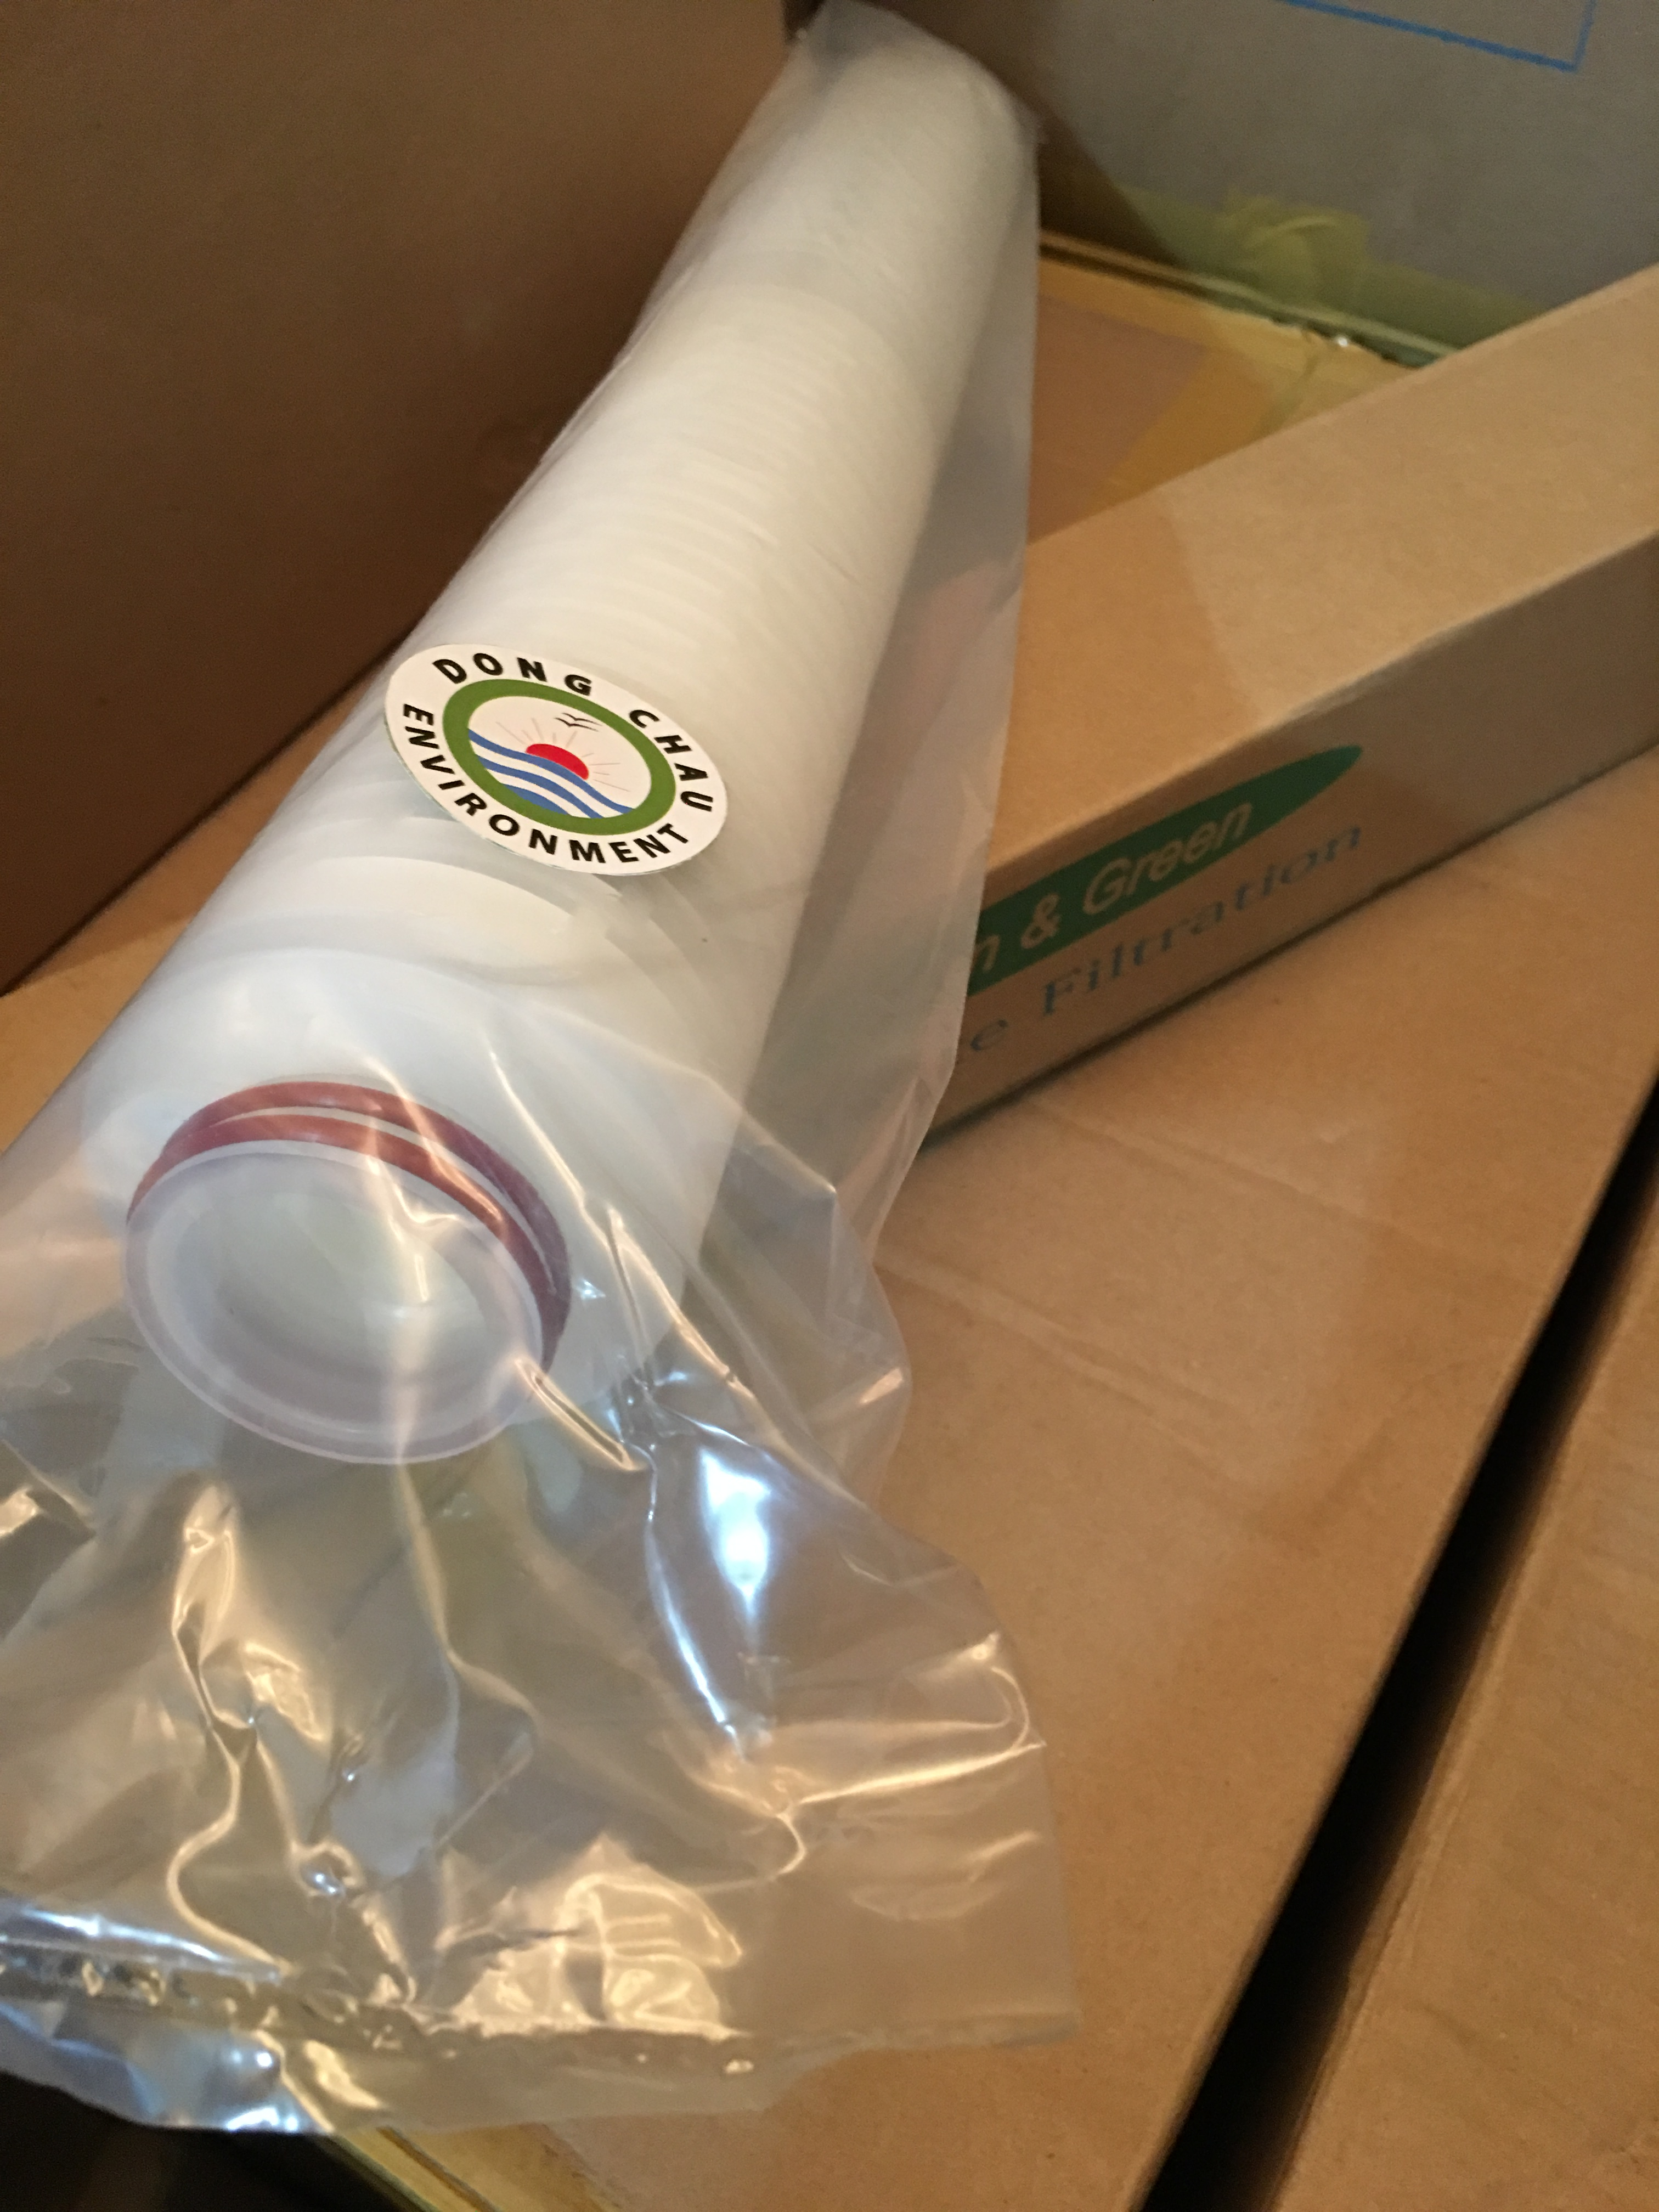 Lõi lọc giấy xếp 1 micron 20 inch oring 222 Clean Green